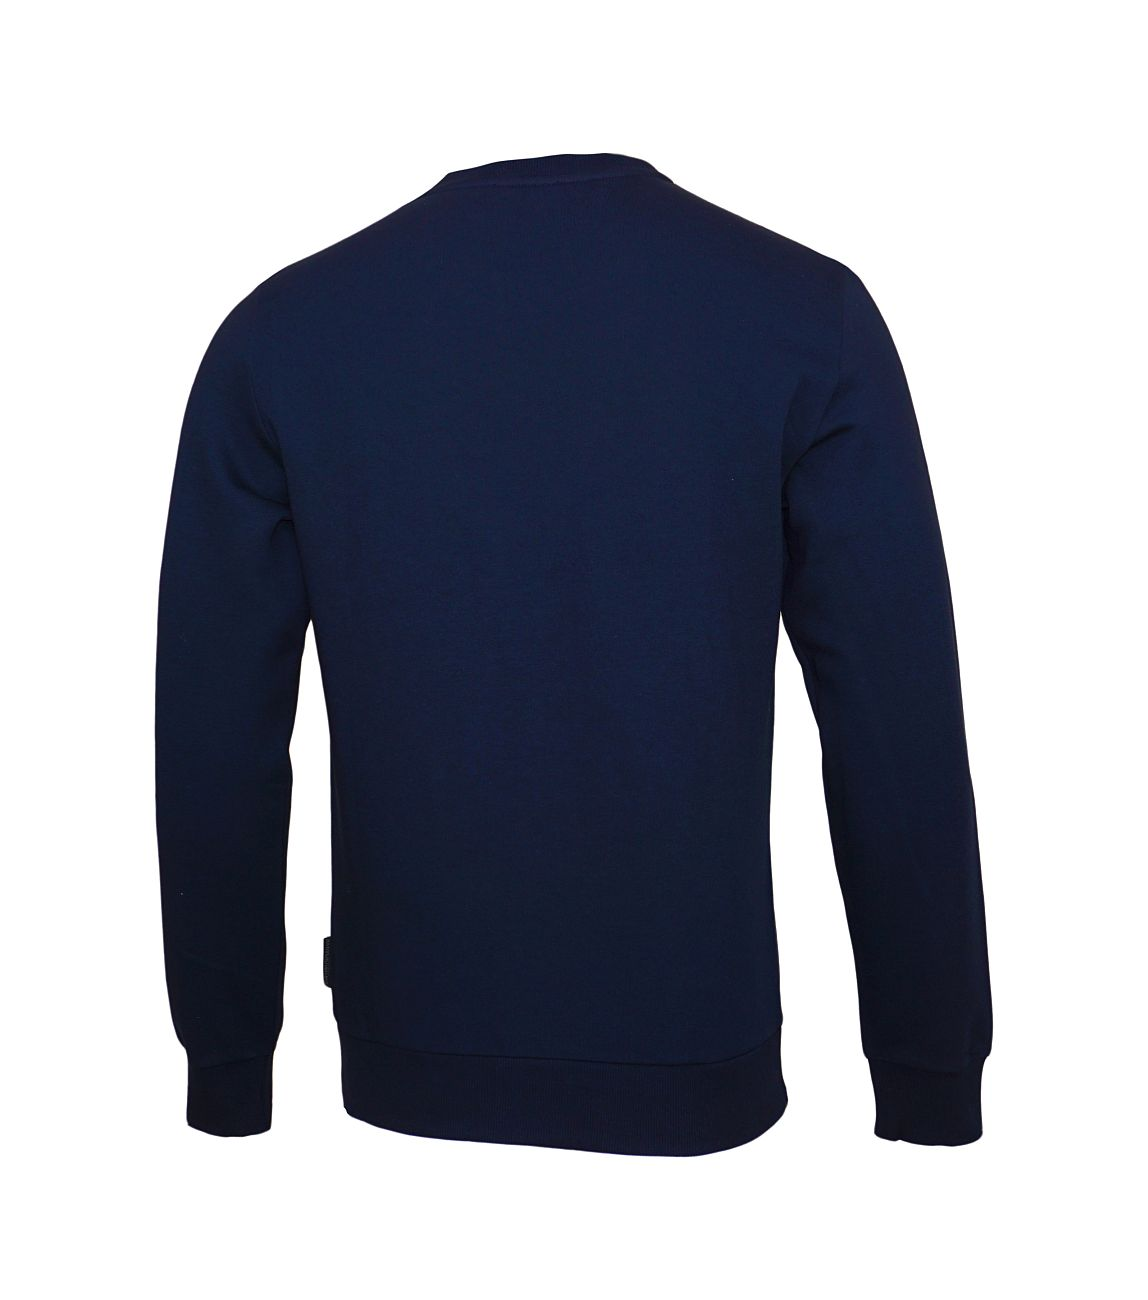 Emporio Armani Sweater Pullover Rundhals 111785 8A571 00135 MARINE SH18-EAS2